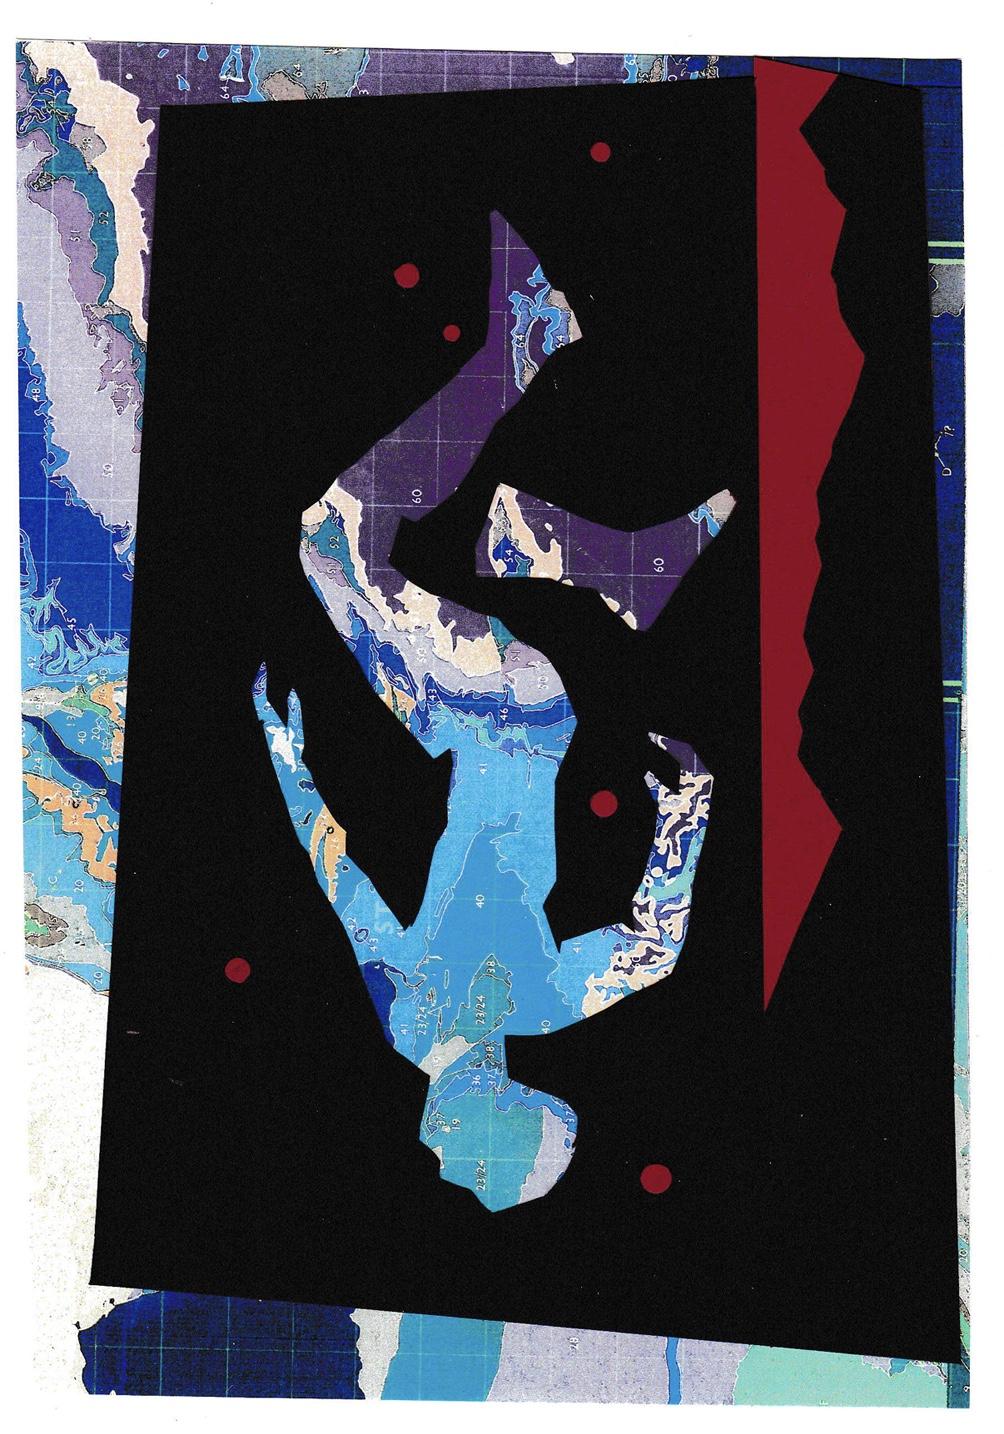 Tipping point I , John Pratt, woodcut/collage, 2018